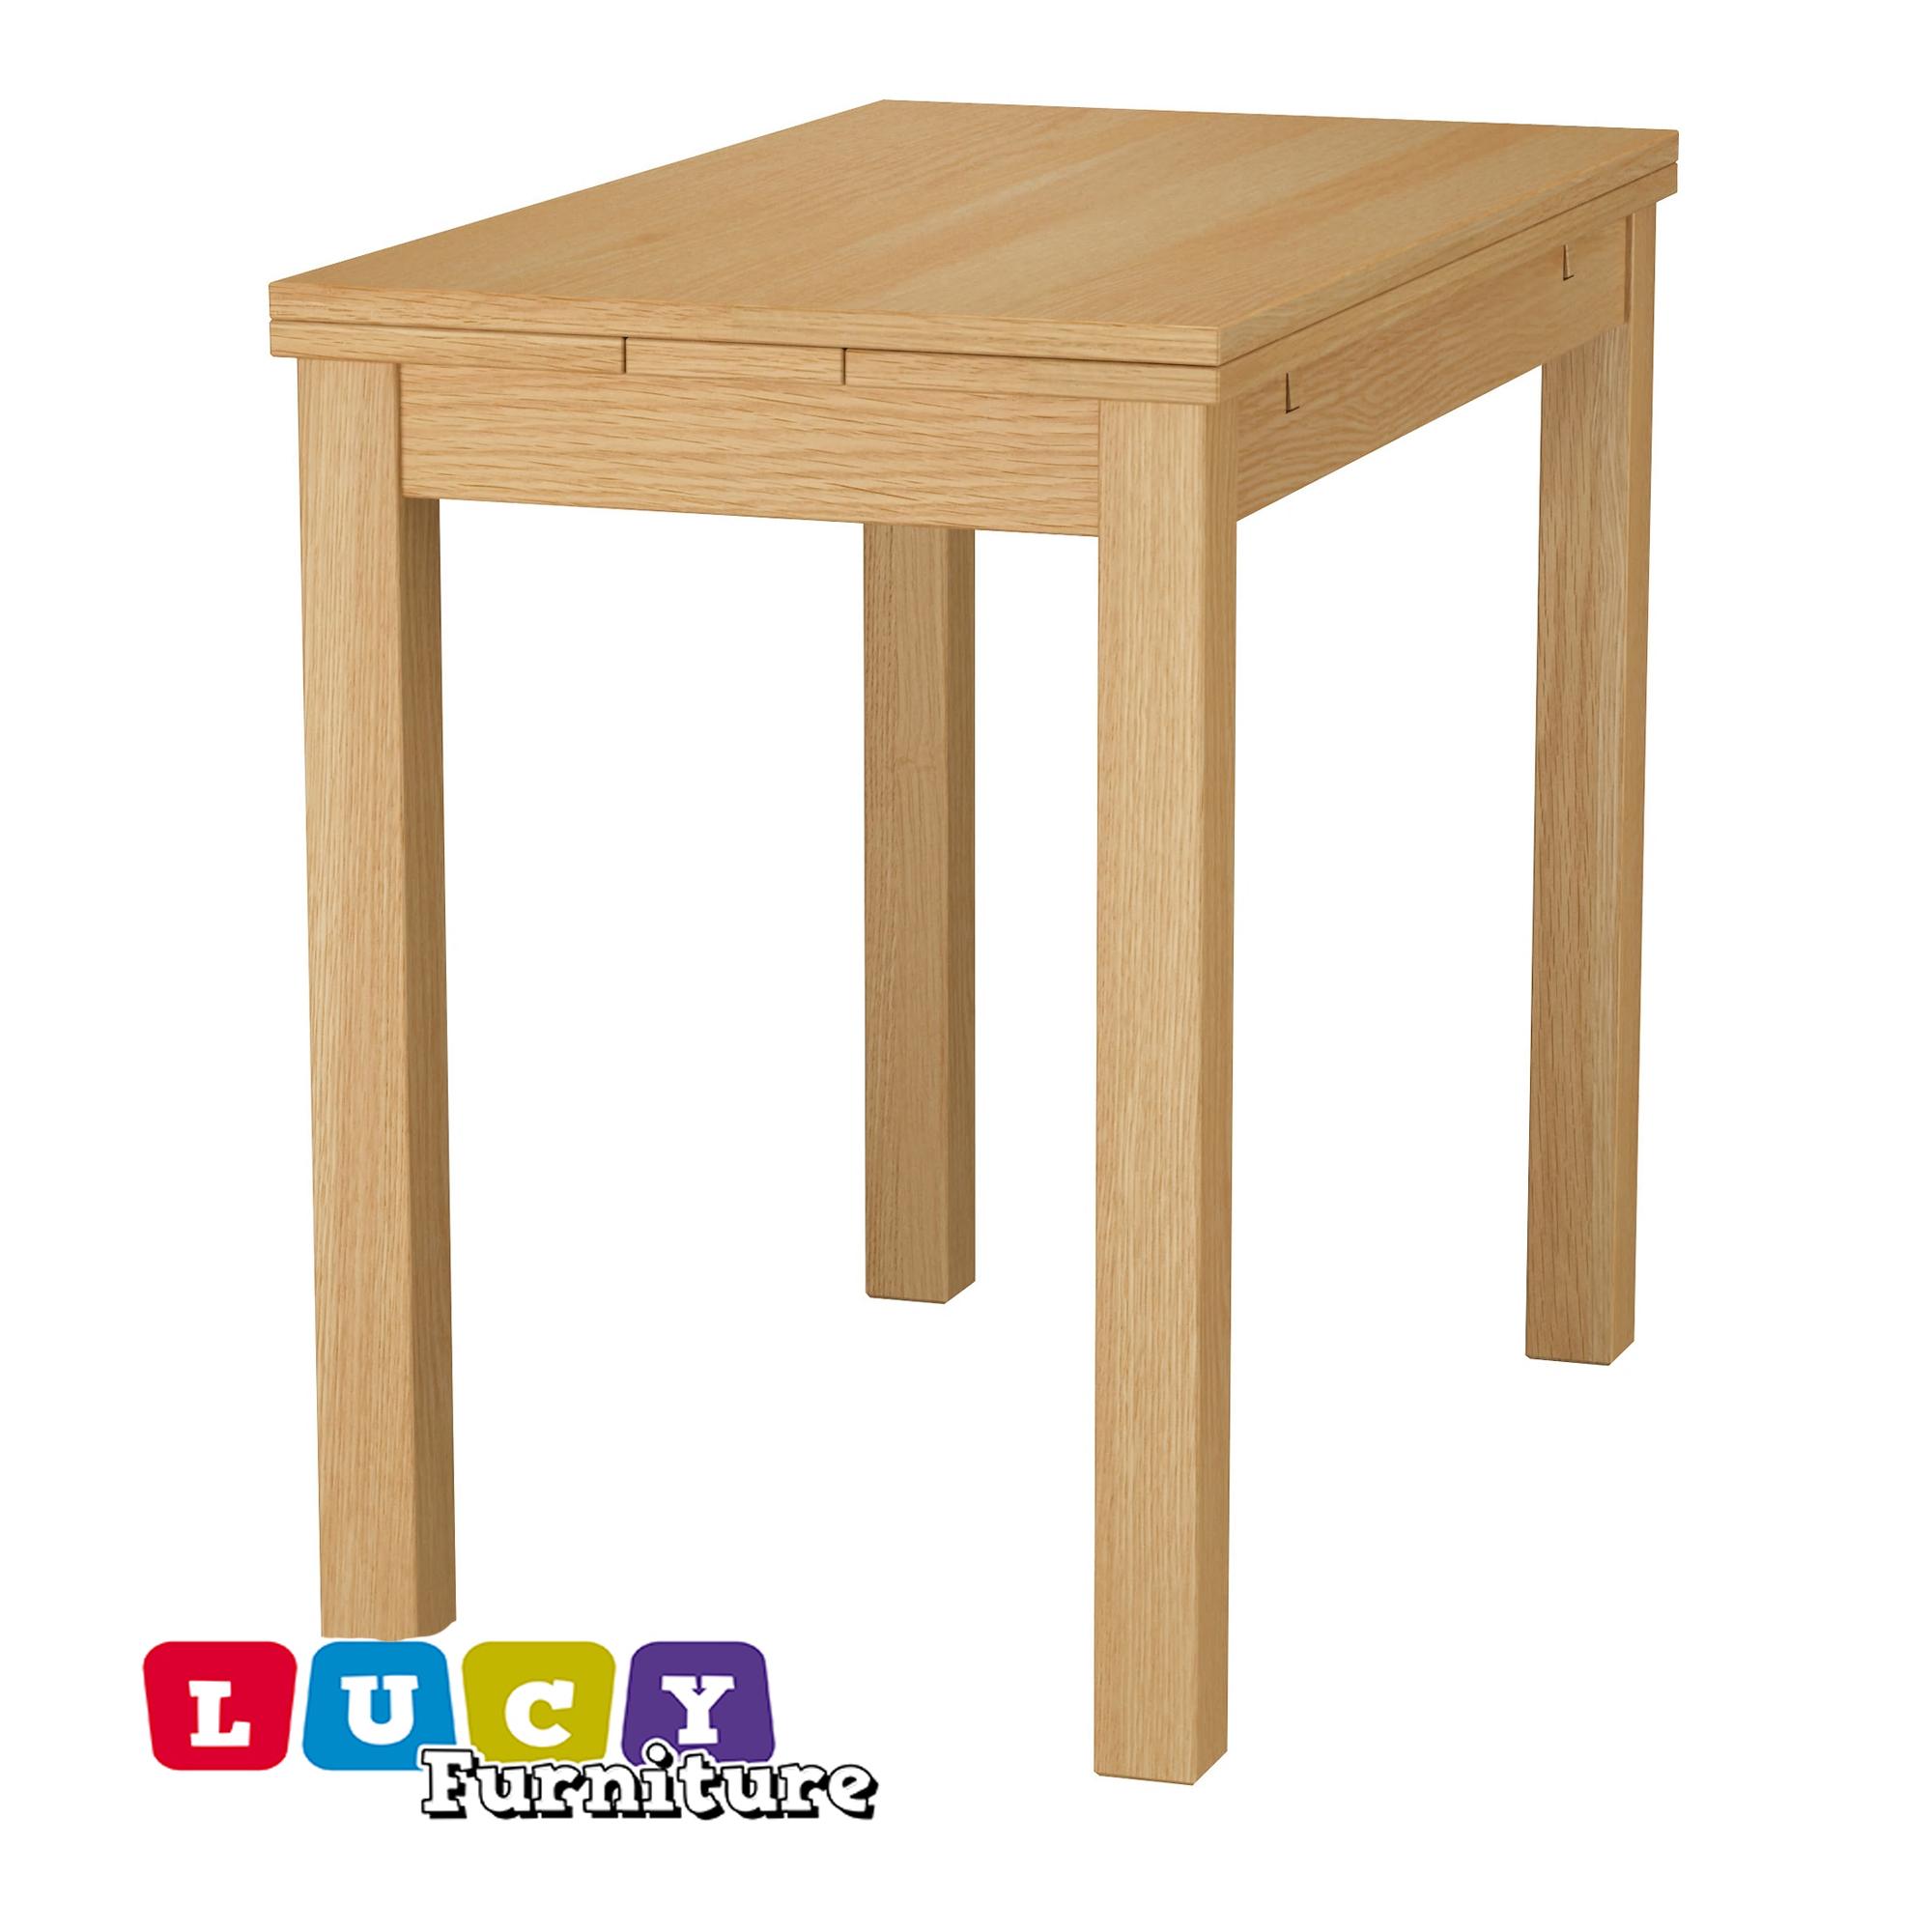 Details About Ikea Bjursta Extendable Table Oak Veneer New